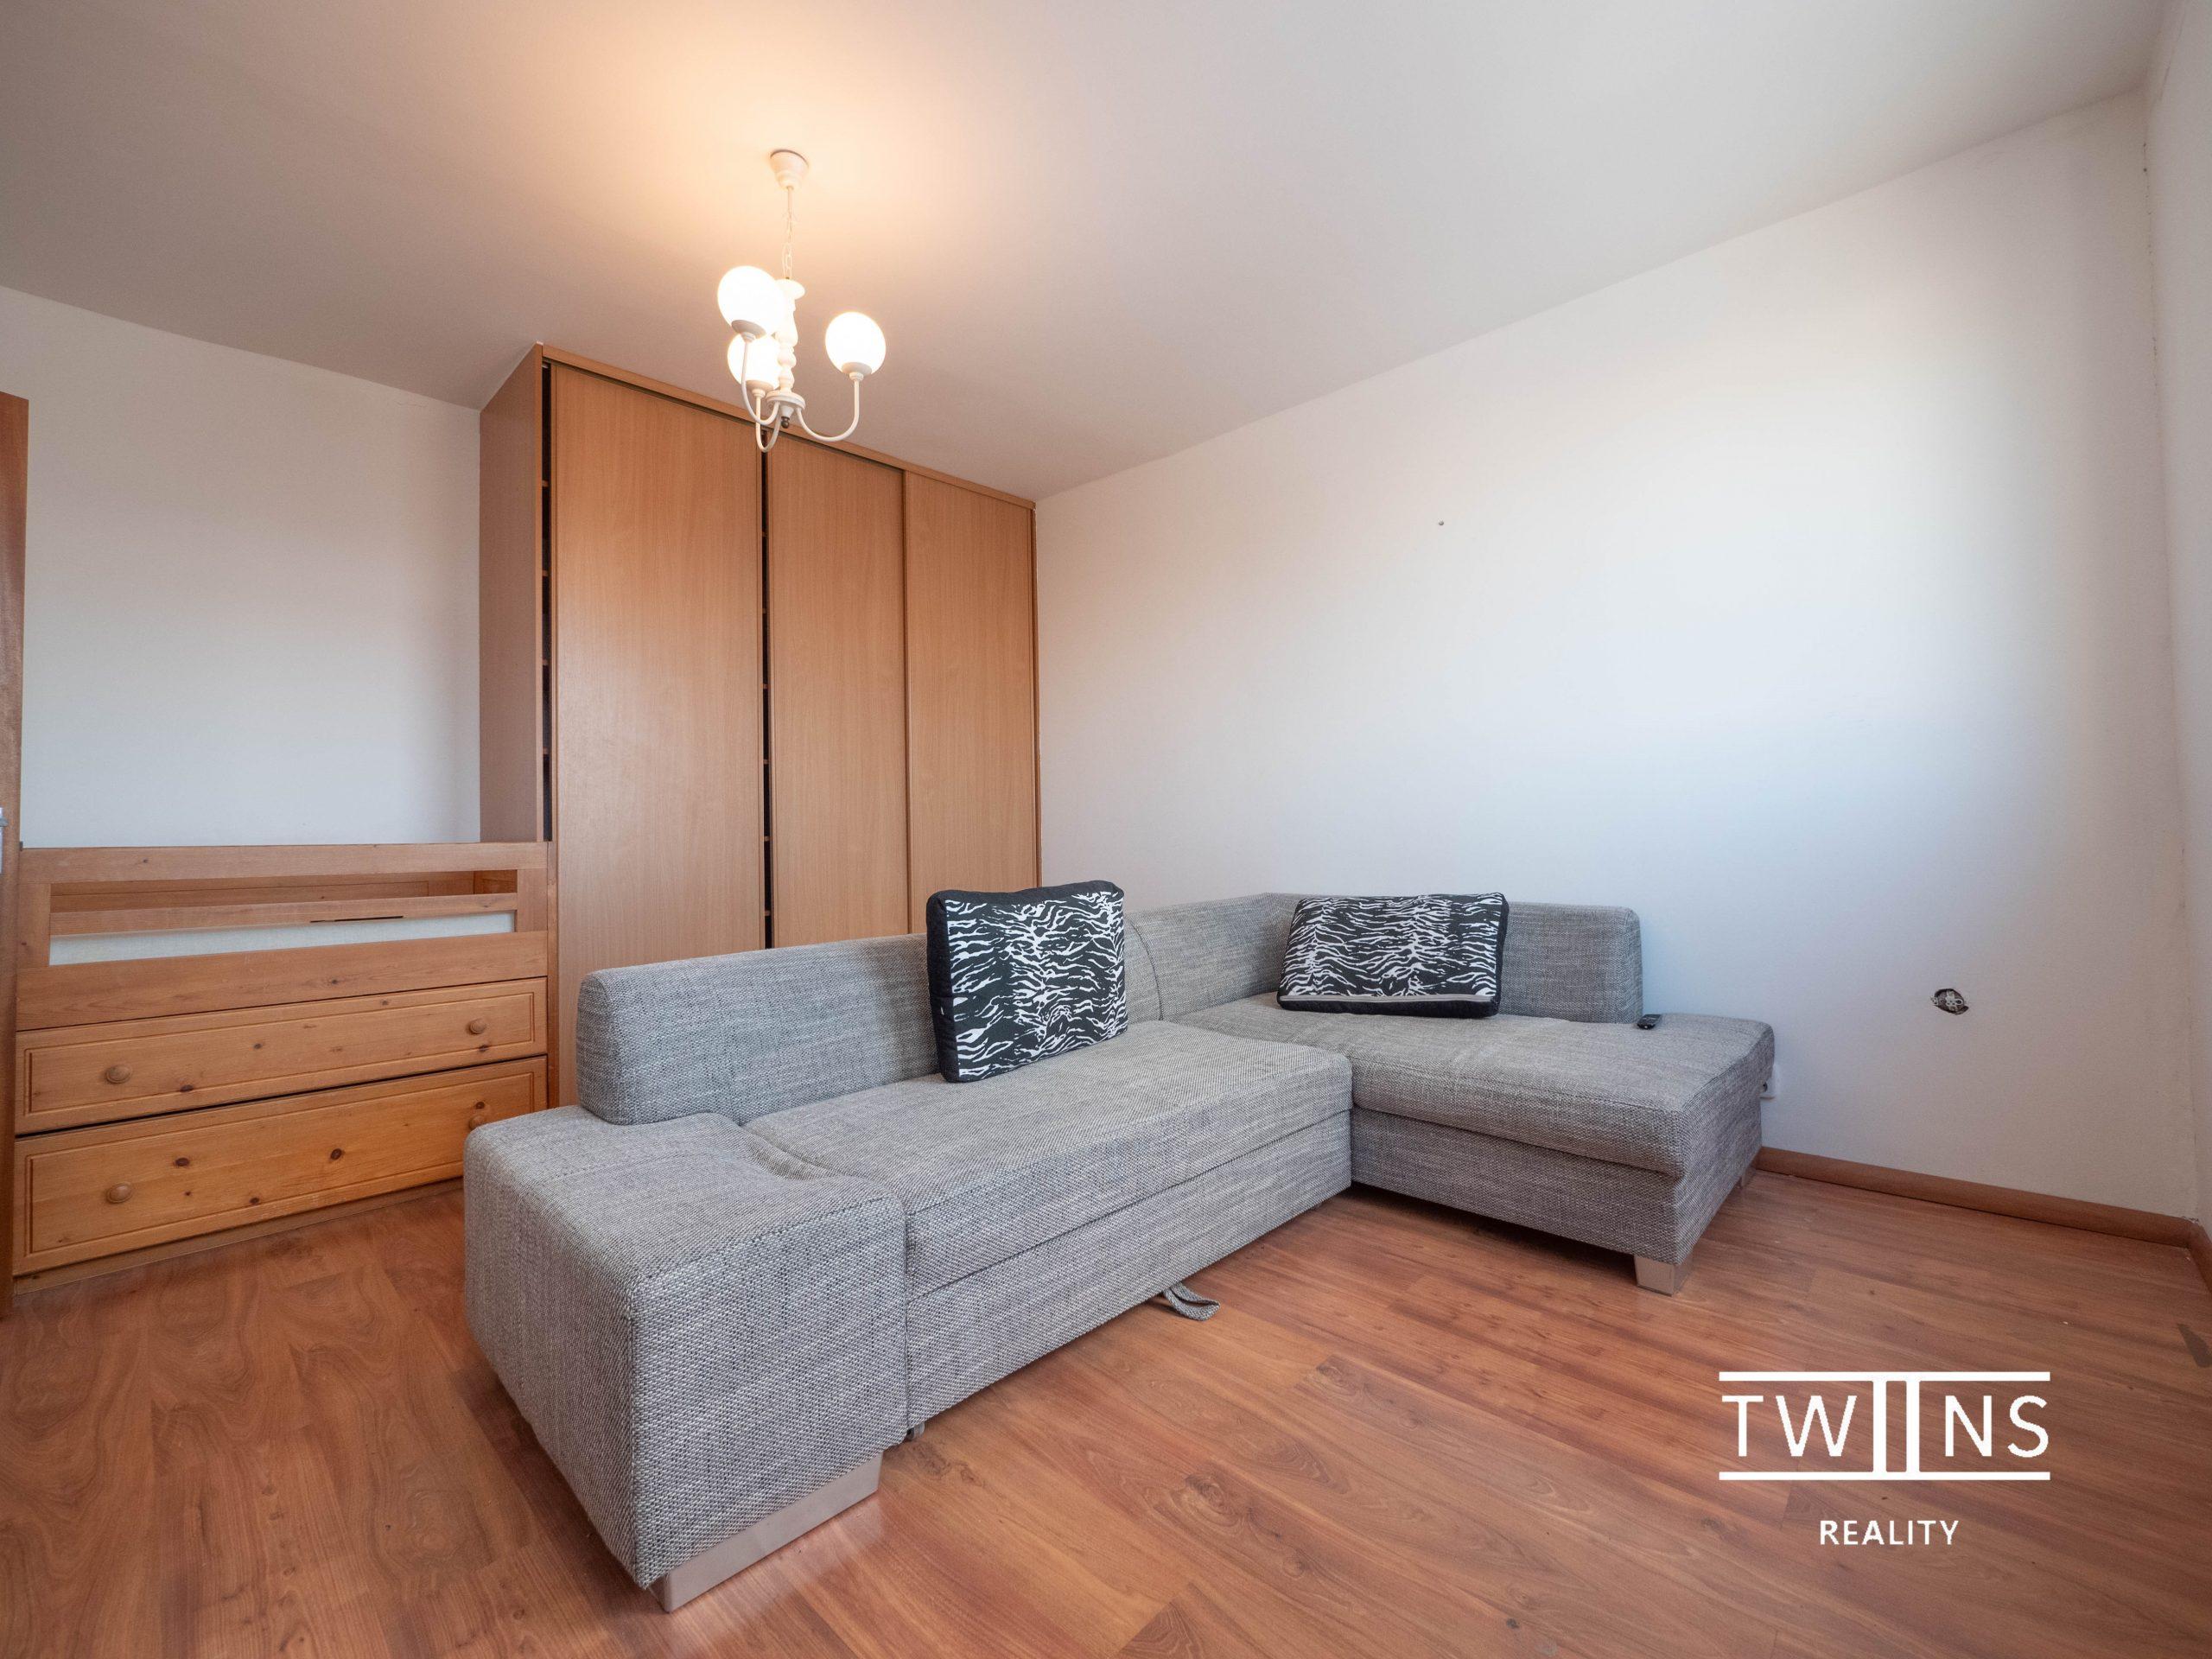 ✅TOP POnuka💎Prenajmeme 1 izbovy byt na Fedinovej ul. v Petržalke, kompl.zar.,💶420€,